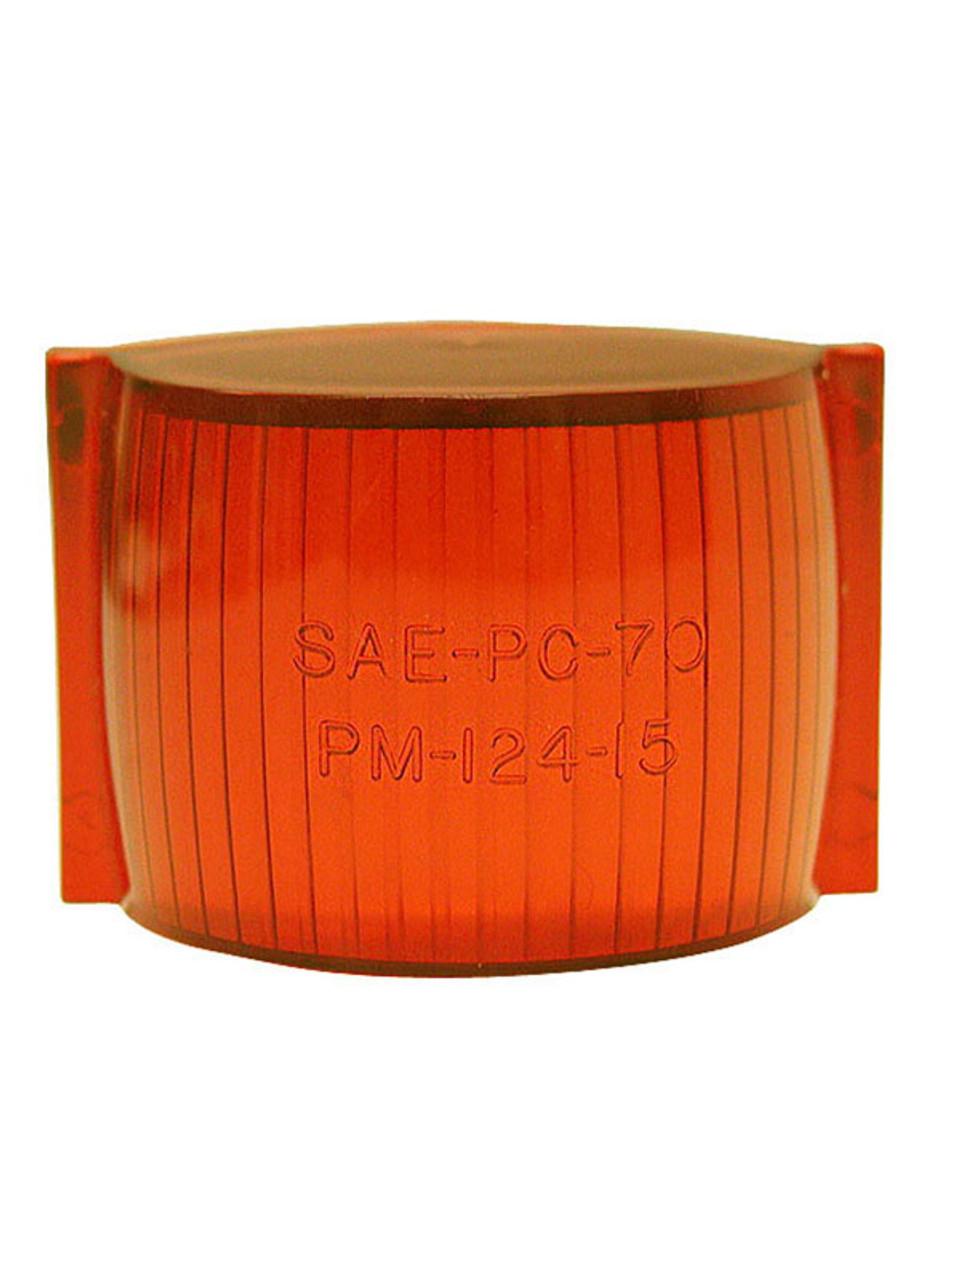 124-15A --- Peterson Replacement Amber  Rectangular  Lens